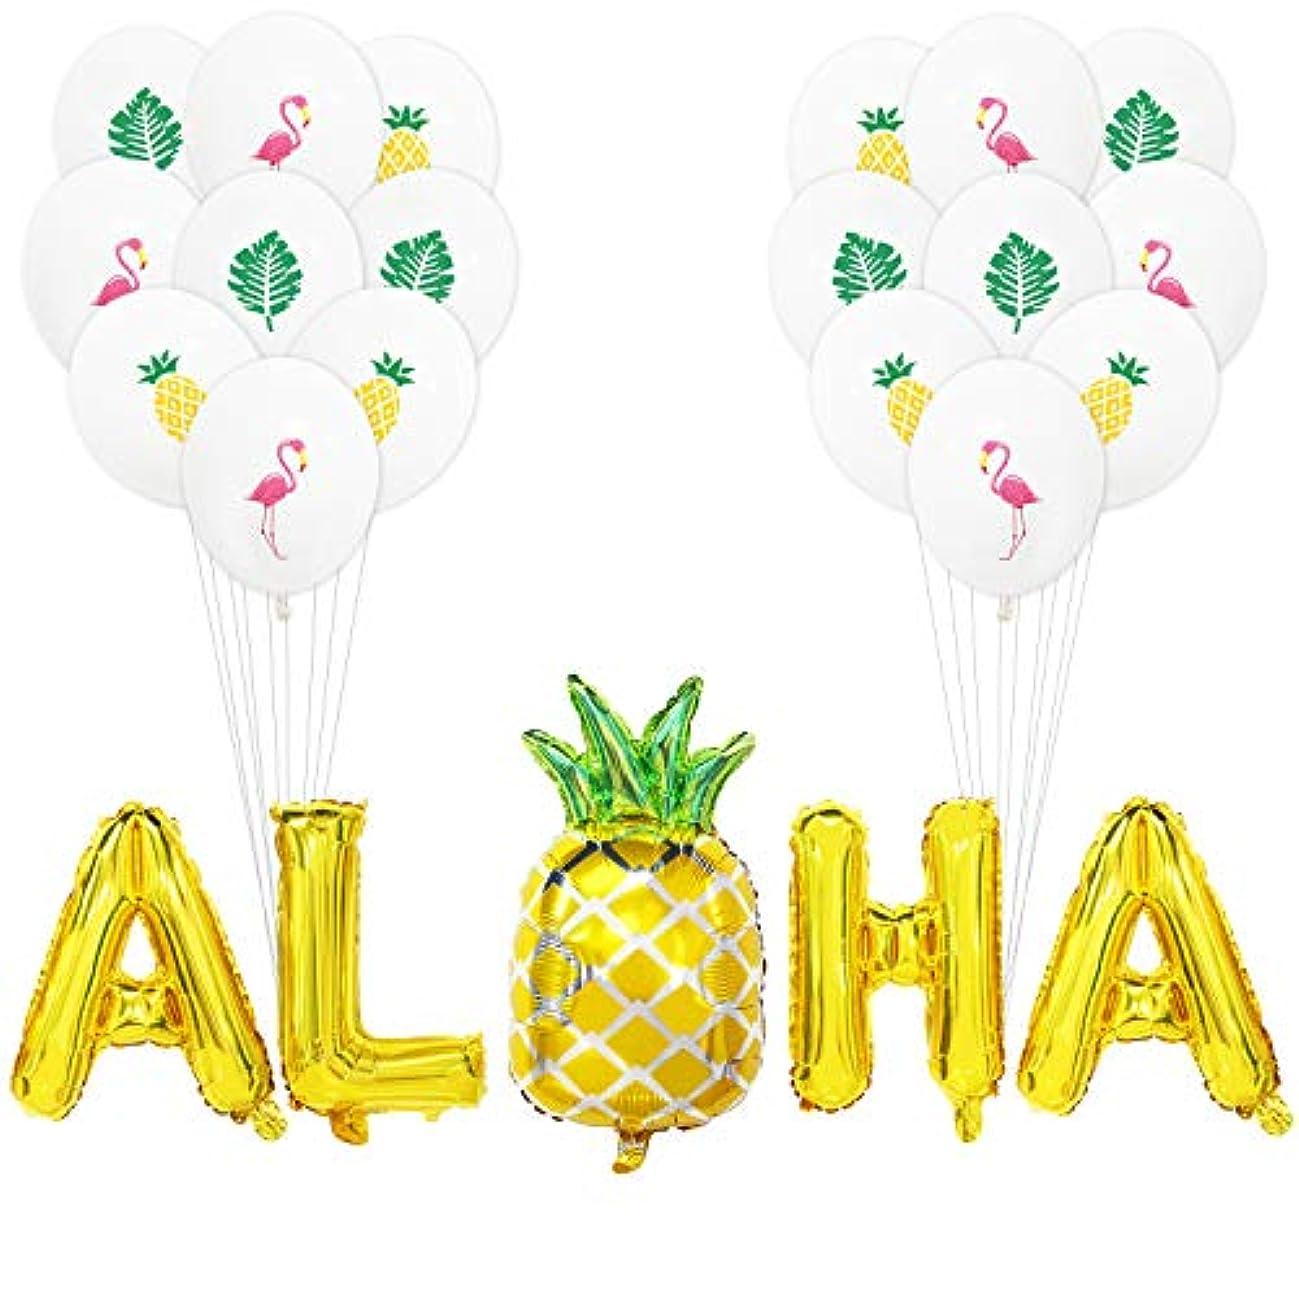 Aloha Balloon Banner | Aloha Balloon Letters | Aloha Balloons with Pineapple | Aloha Balloons Large | Aloha Balloons Gold Pineapple | Aloha Mylar Balloons | Hawaii Luau Aloha Party Decorations | 16IN